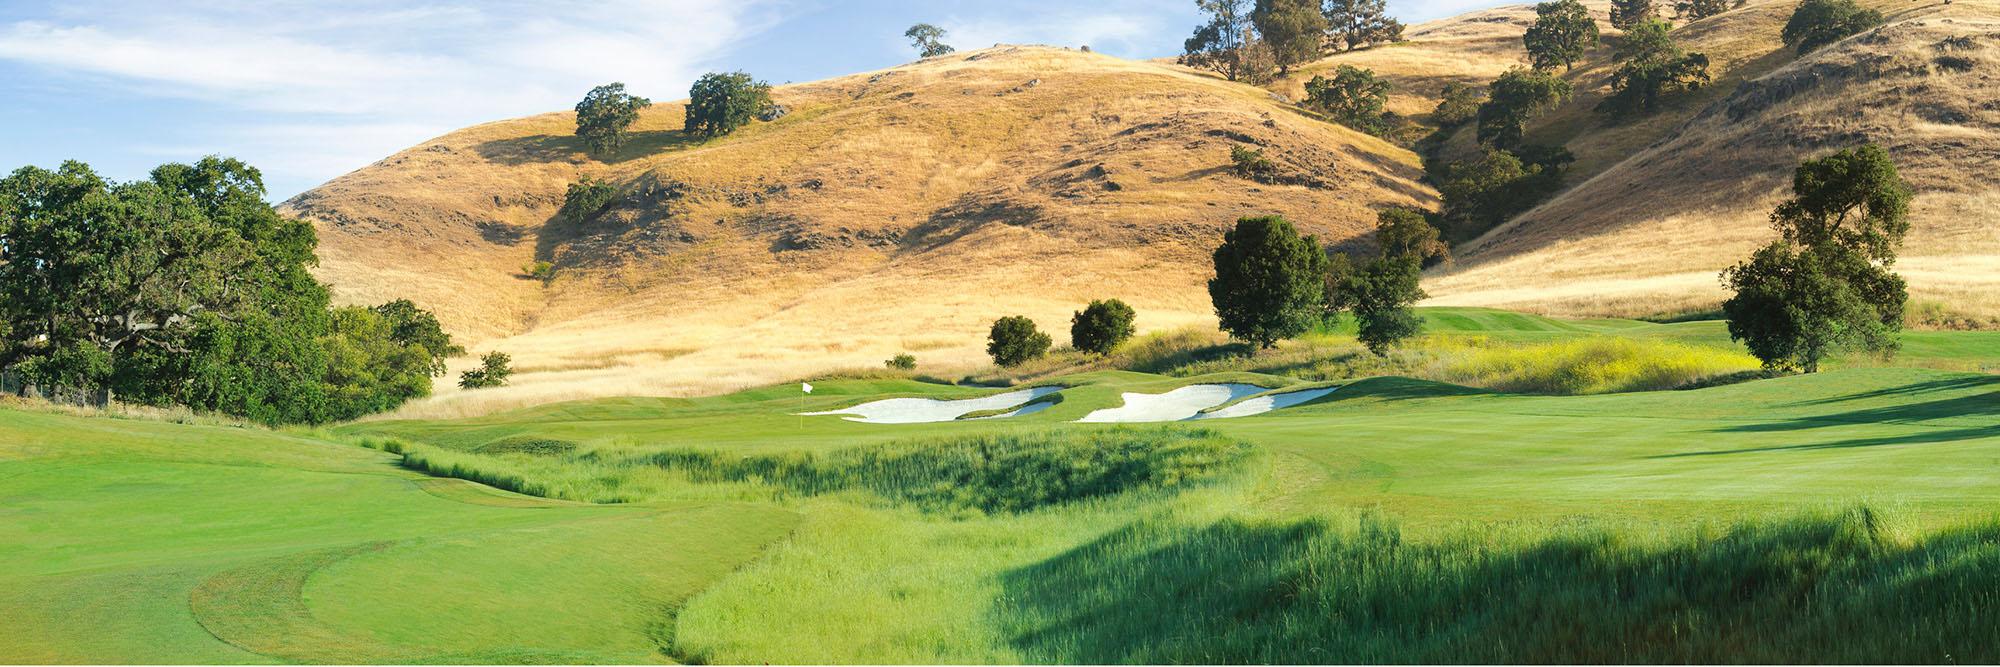 Golf Course Image - CordeValle Golf Club No. 6